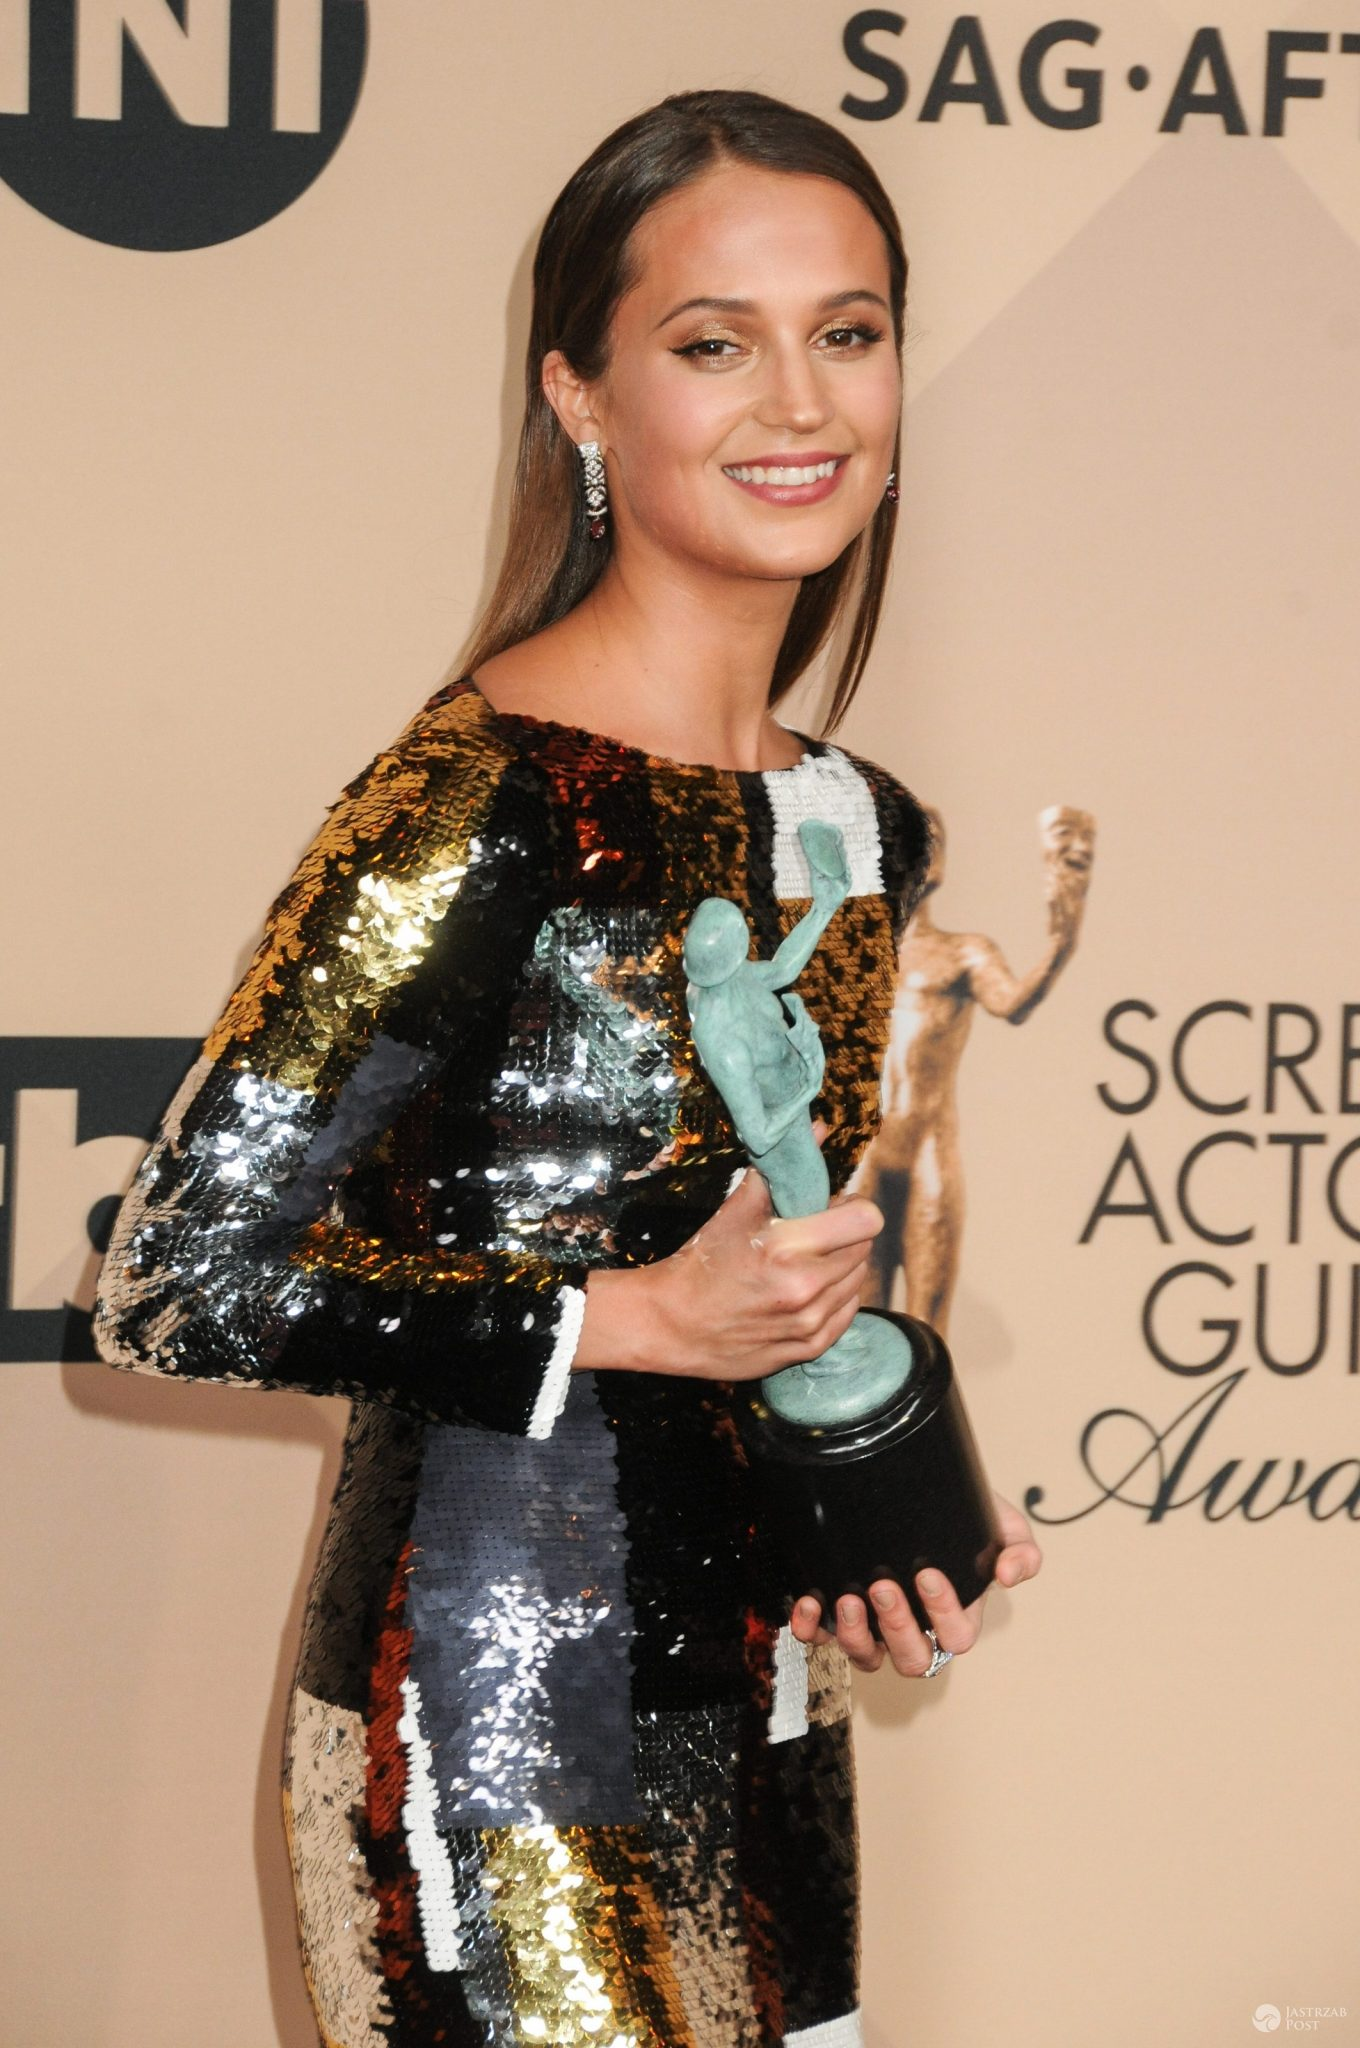 Alicia Vikander, najlepsza aktorka drugoplanowa, SAG Awards 2016 (fot. ONS)